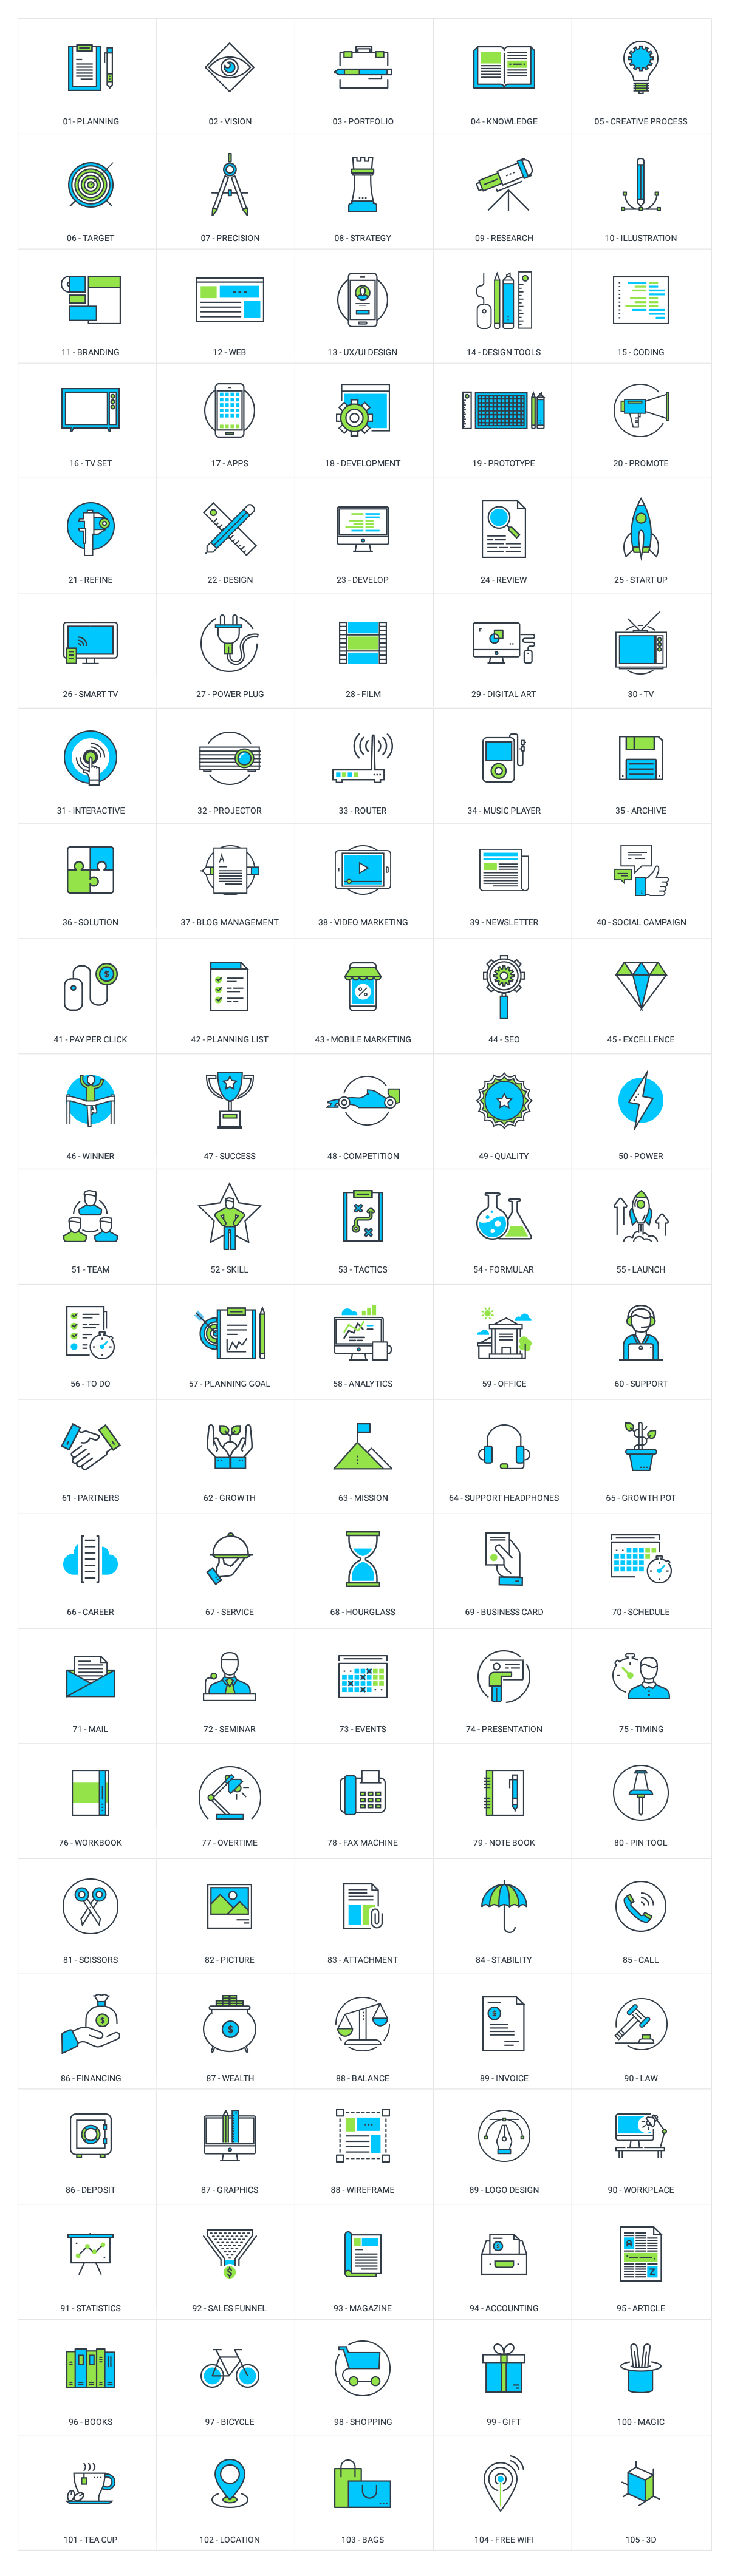 Icons BlueGreen